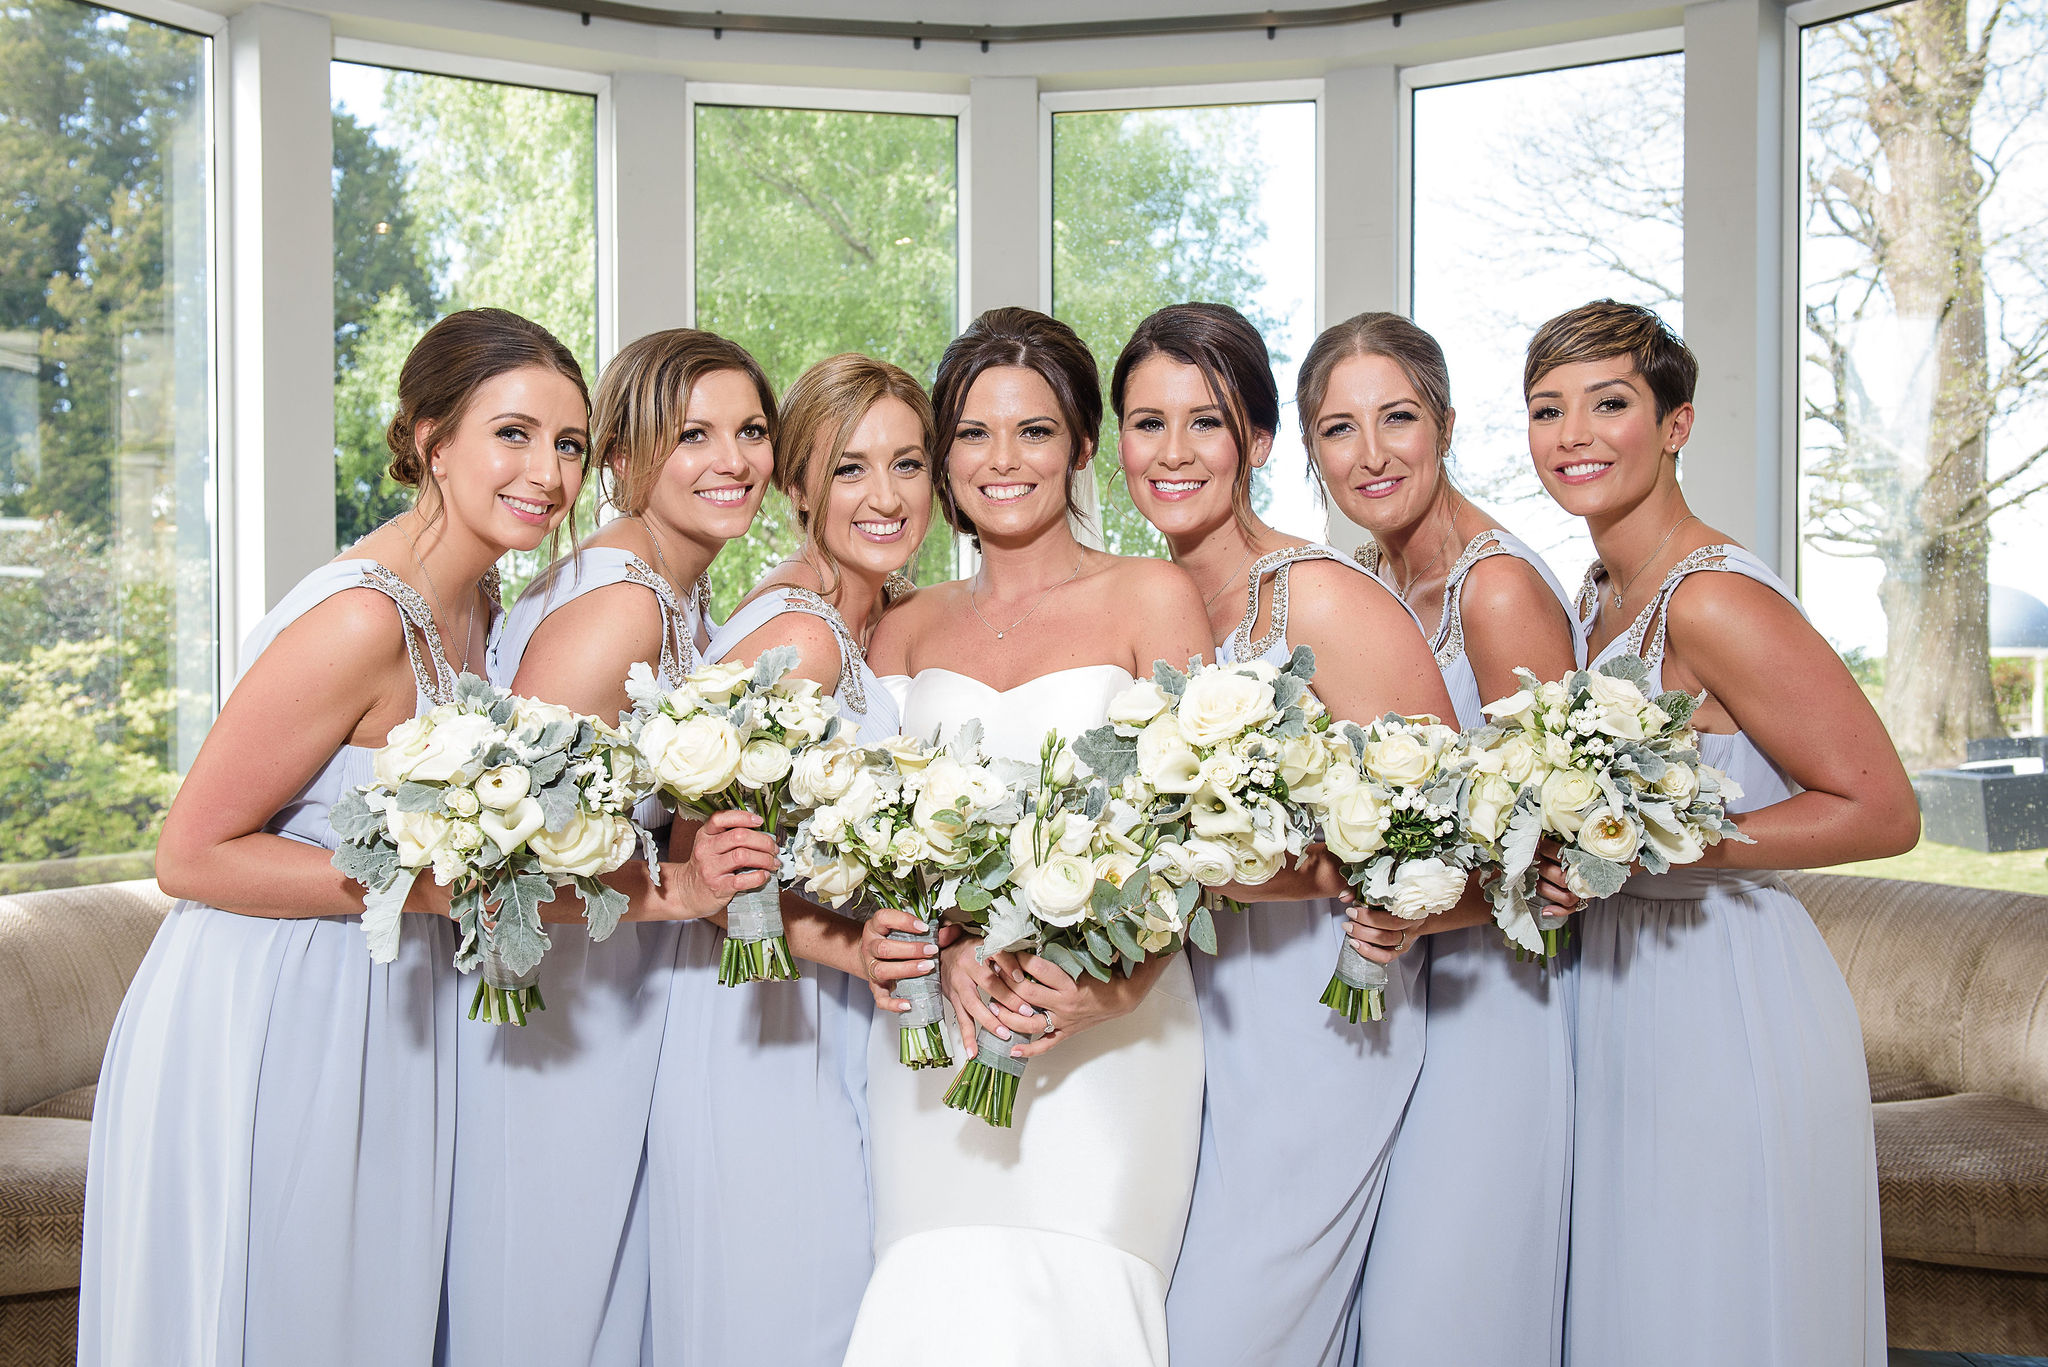 wedding-day-photograph-of-happy-bridesmaids